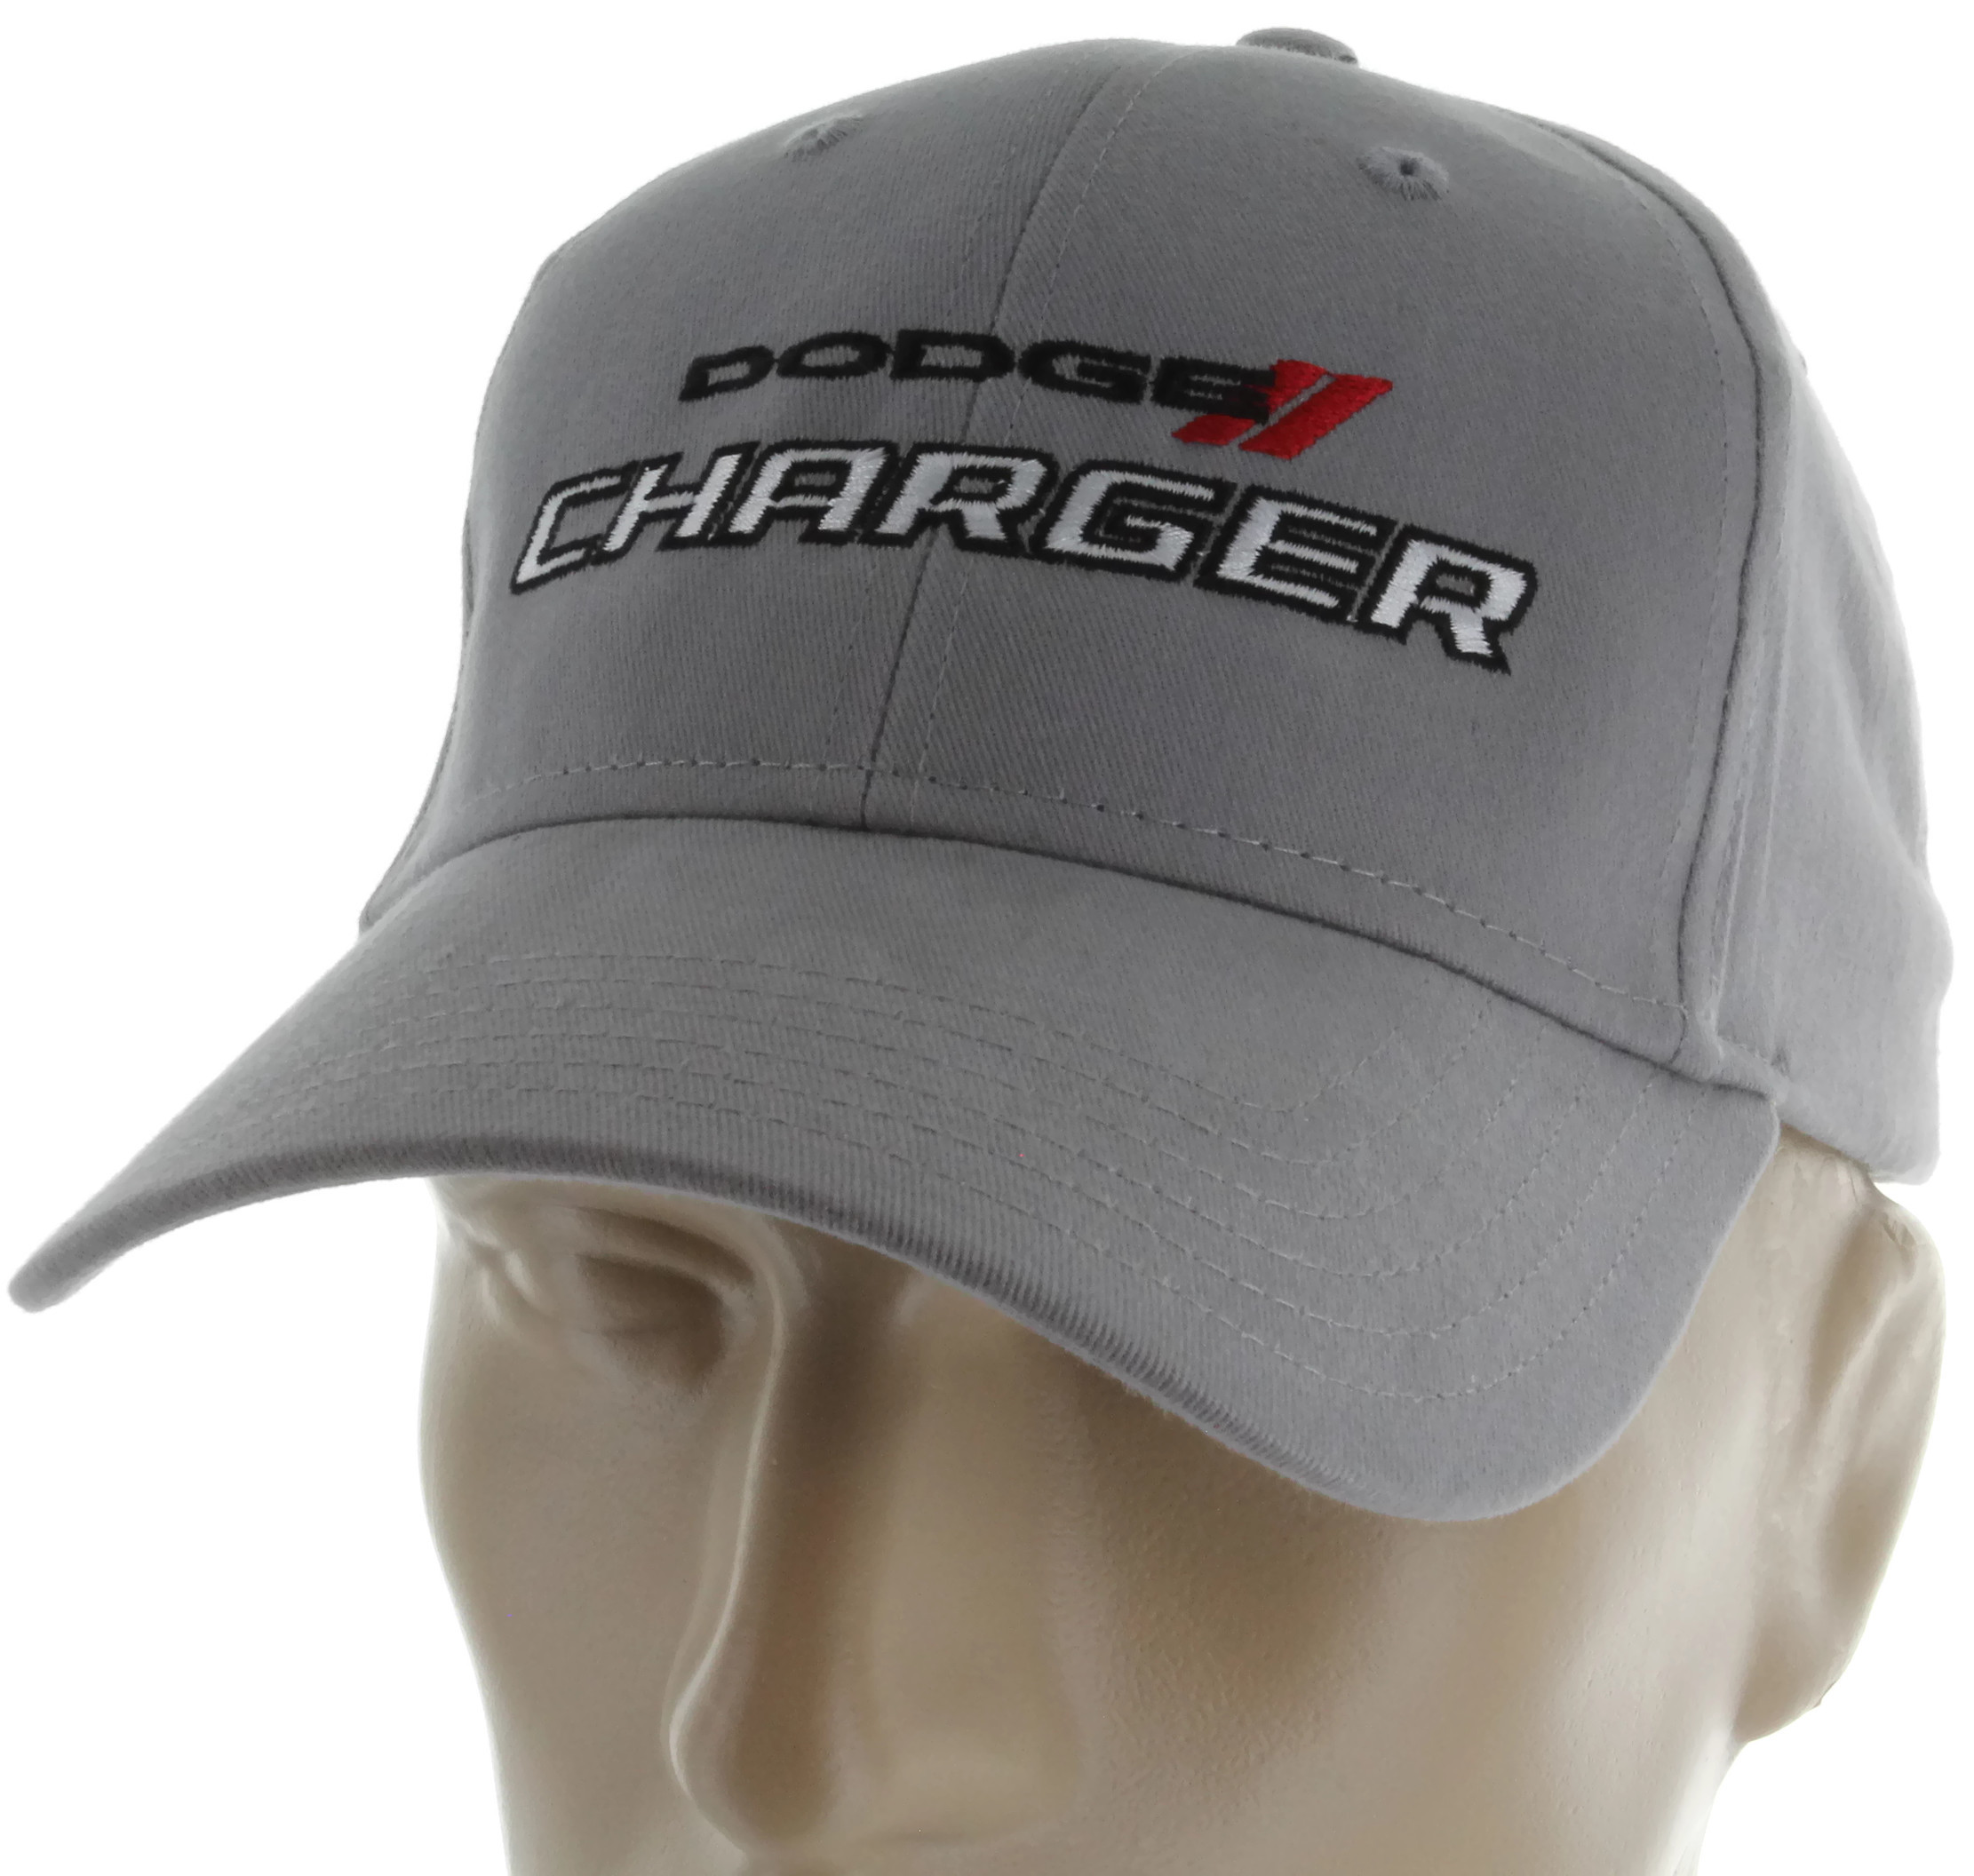 477bd393c21 Details about Dodge Charger RT Gray Baseball Cap Trucker Hat Snapback SRT  Mopar